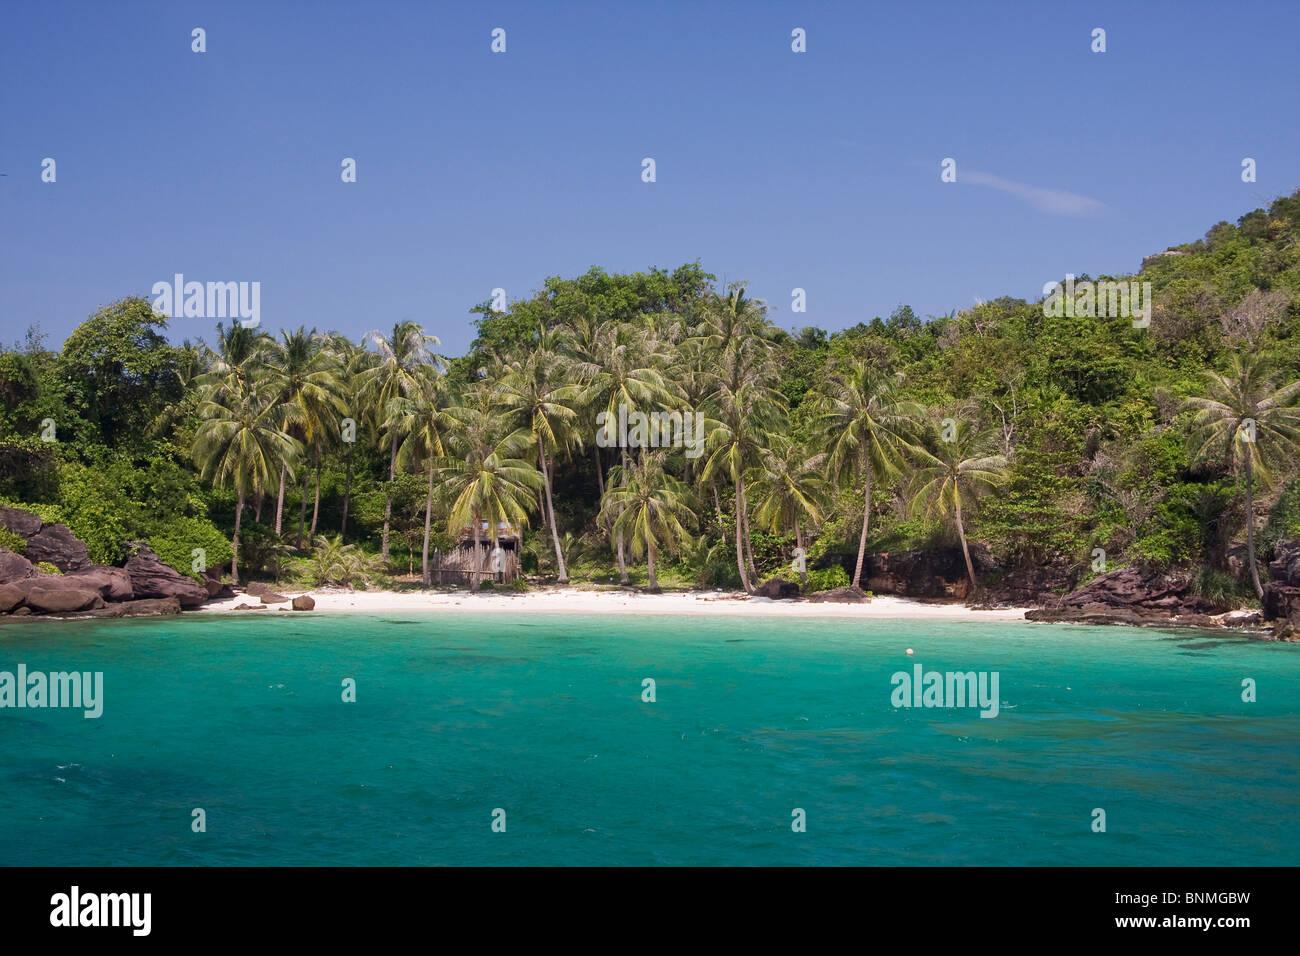 Ambiente de playa ambiente dream dream-like isla de vacaciones celestial como larga piscina palm Phu Quoc arenosos Imagen De Stock